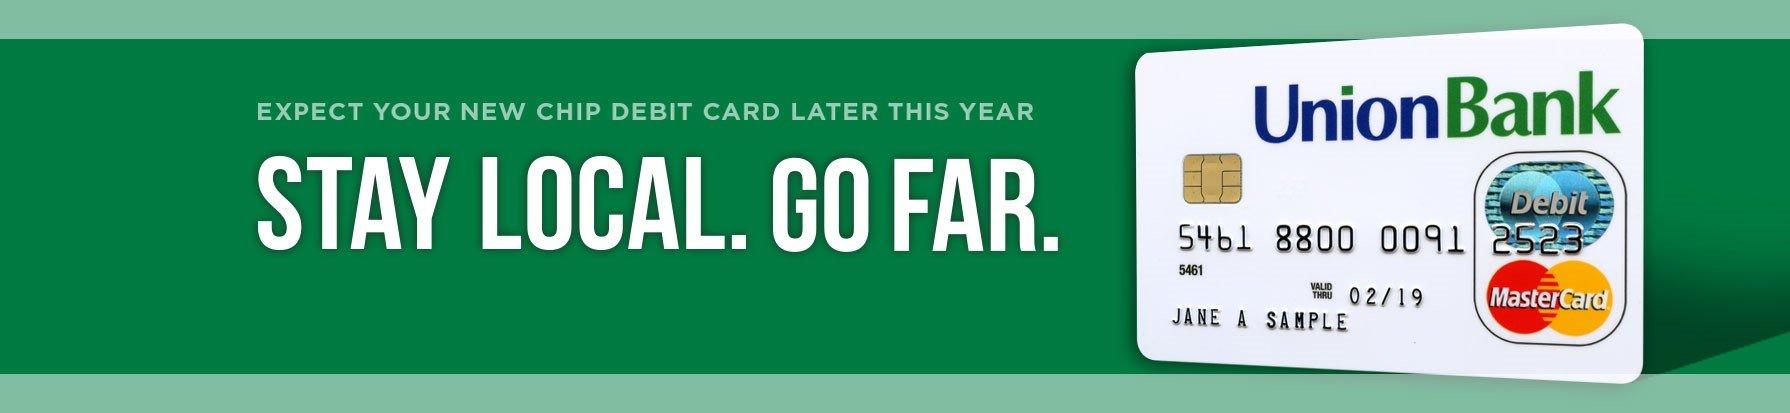 Chip Debit Cards